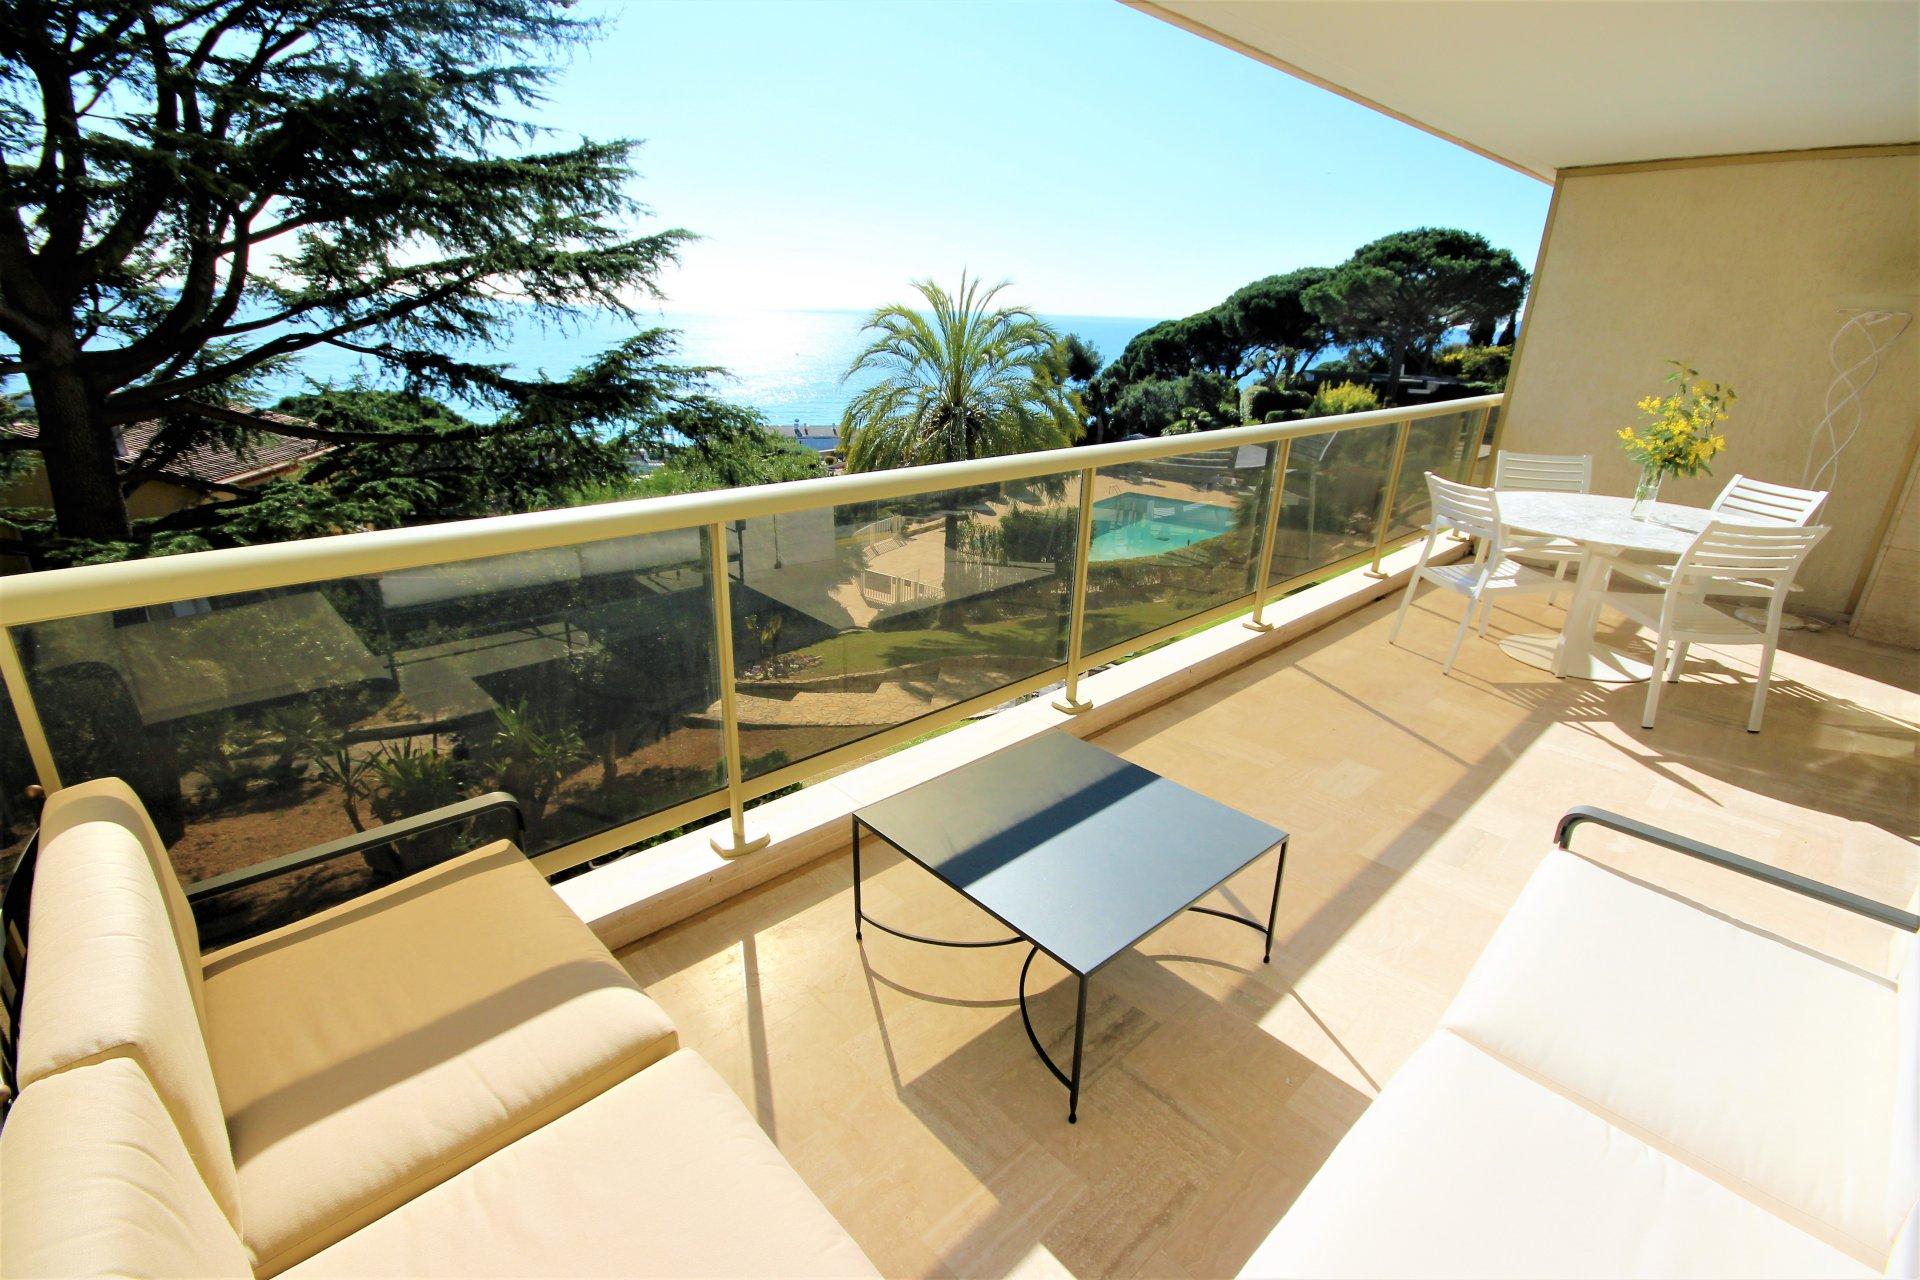 Cannes Croix des Gardes - Beautiful apartment sea view close to the beaches